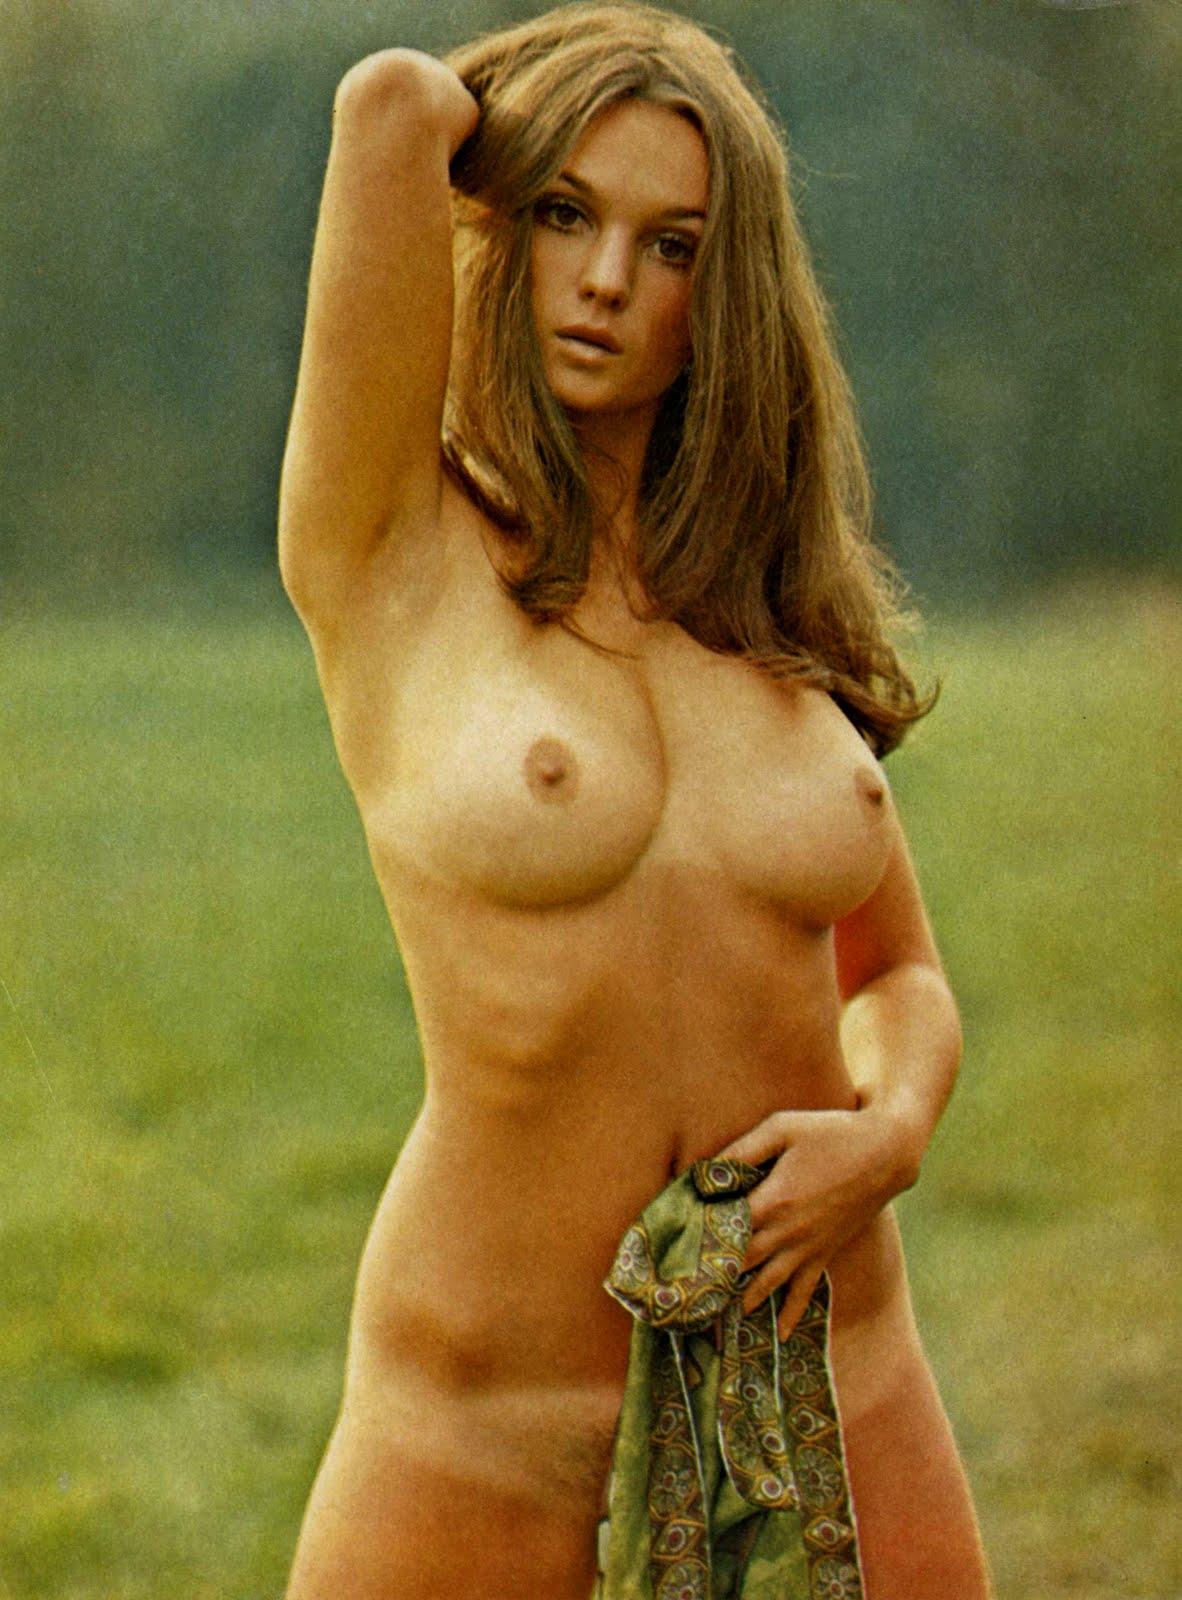 Christina lindberg nude d'accordo